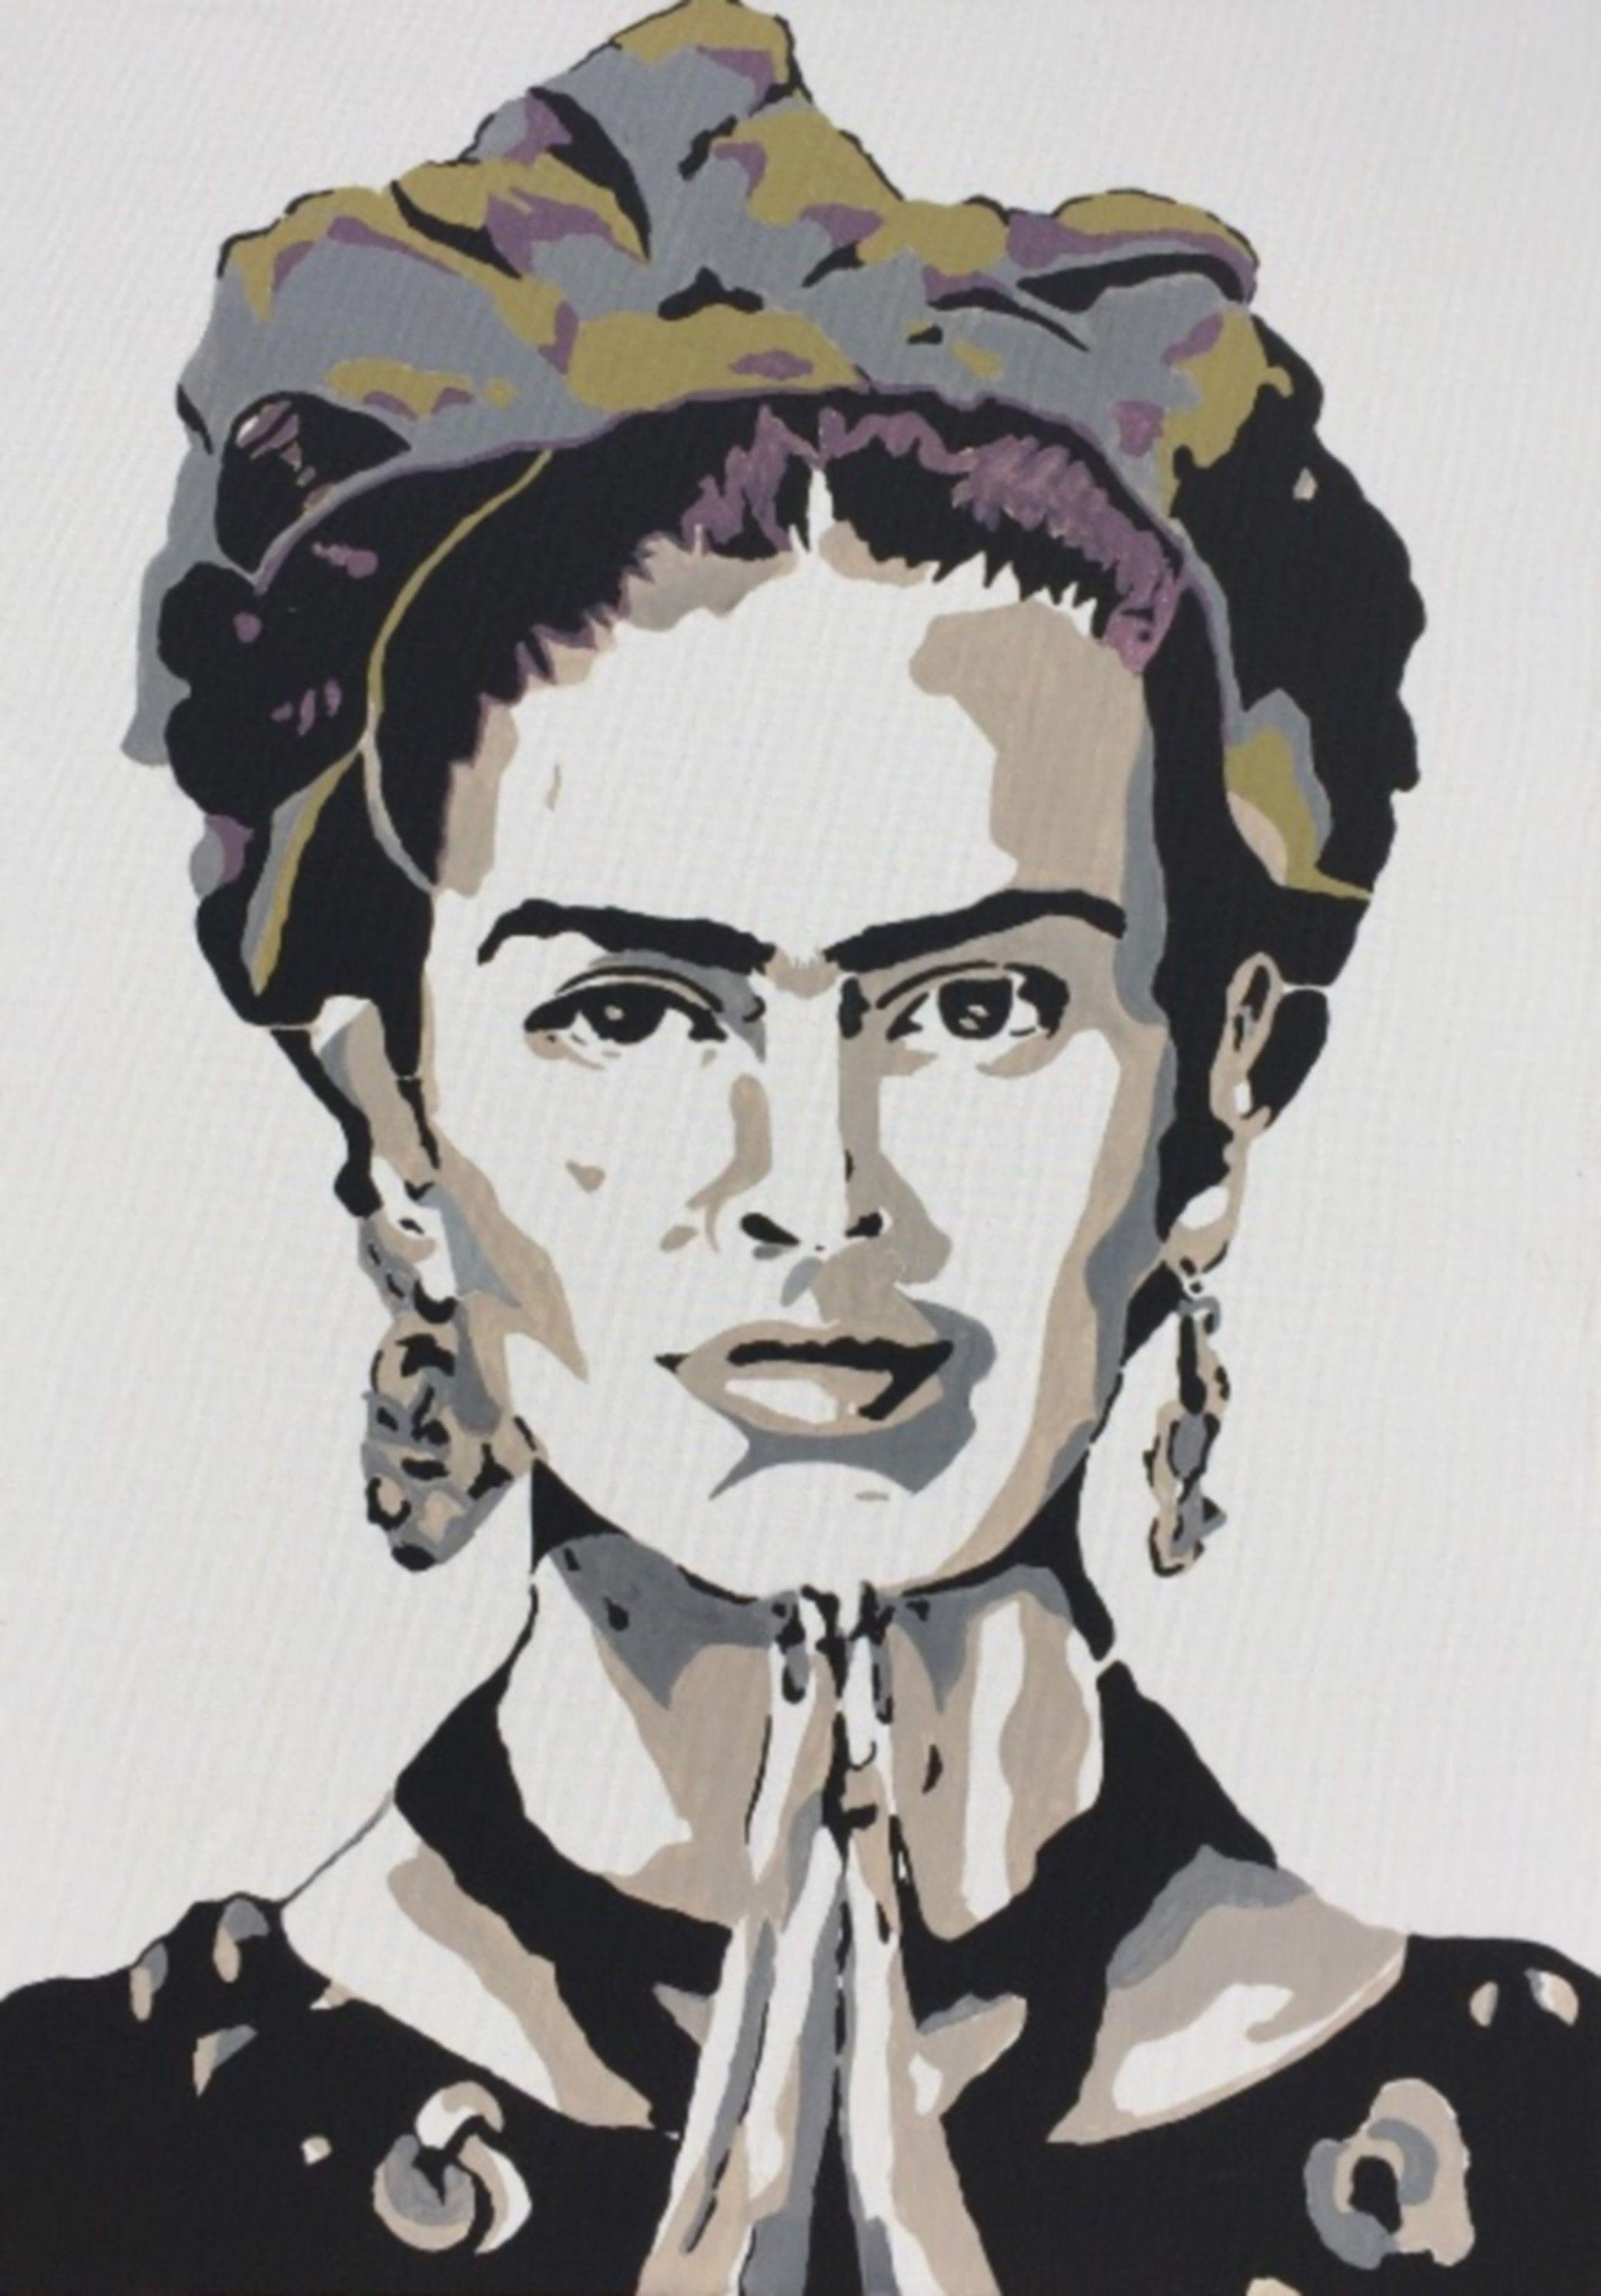 Quadro Moderno Dipinto A Mano.Frida Kahlo Artista Quadro Moderno Dipinto A Mano Style Pop Art Quadri Pittura Acrilico Su Tela Canvas Ritratti Artetribute Artepopart Pop Art Pittura Acrilica Quadri Pop Art